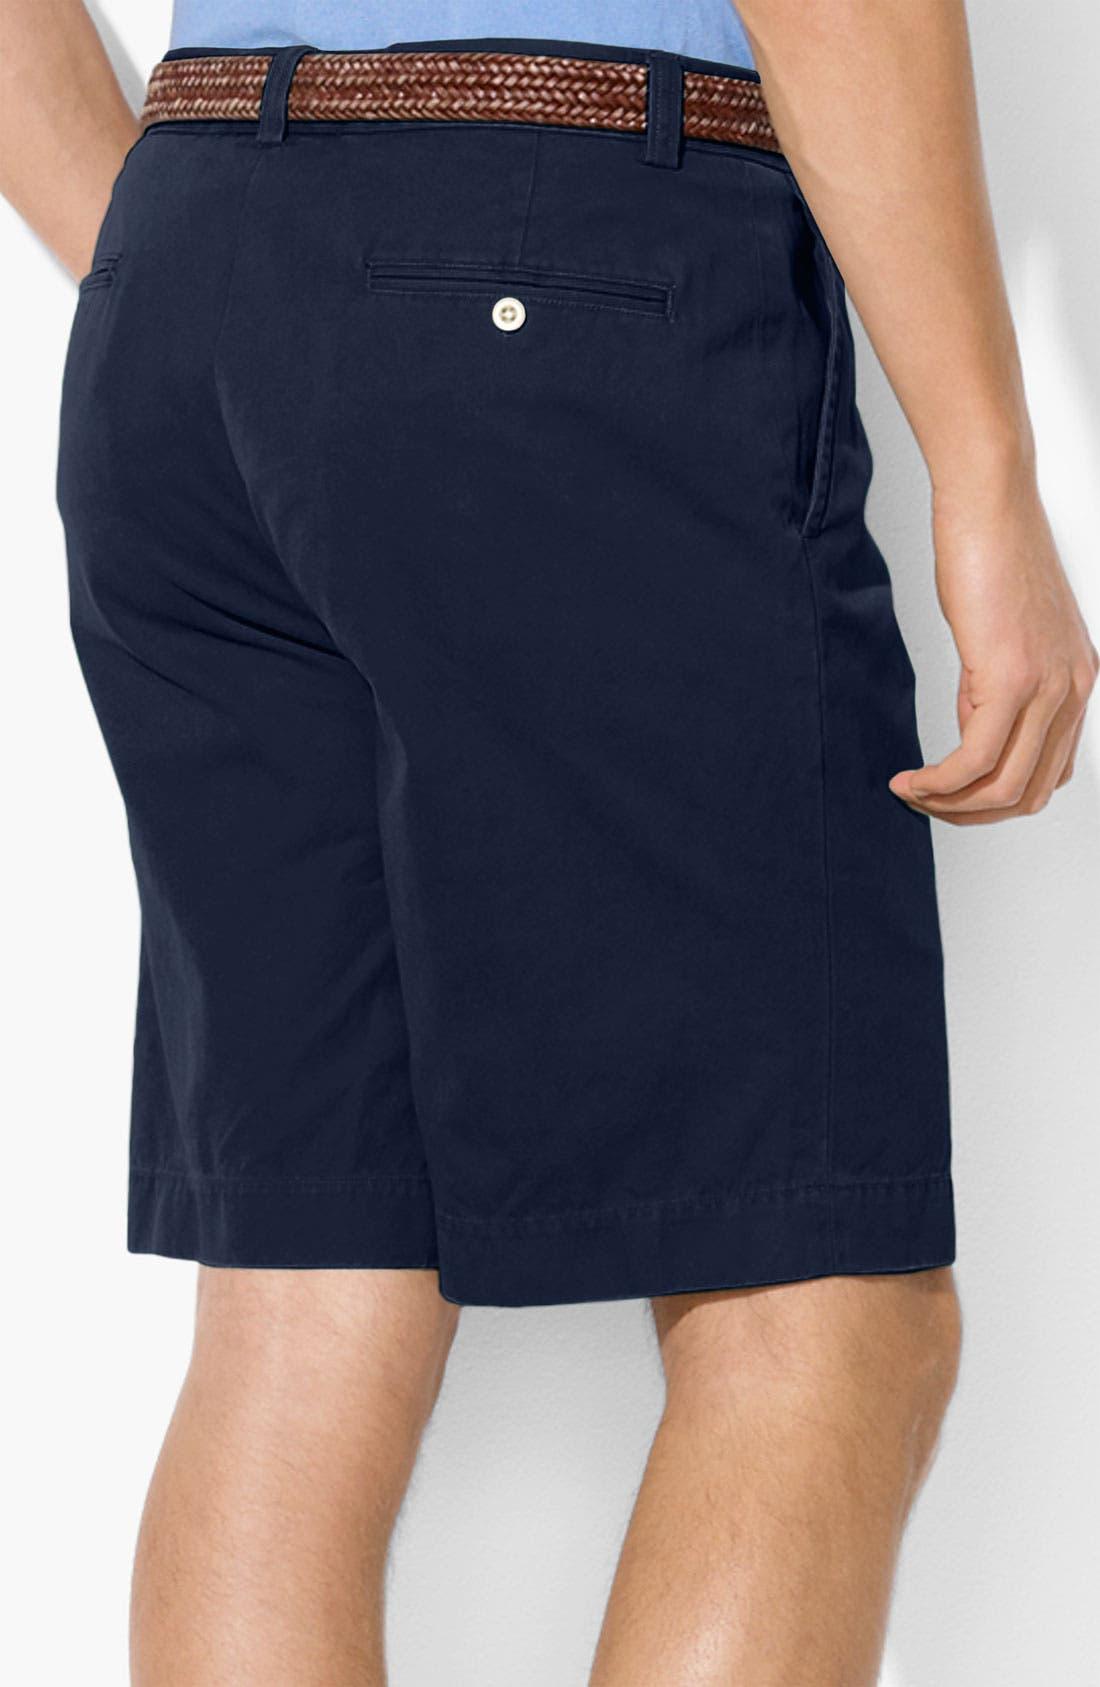 Alternate Image 2  - Polo Ralph Lauren 'G.I.' Classic Fit Shorts